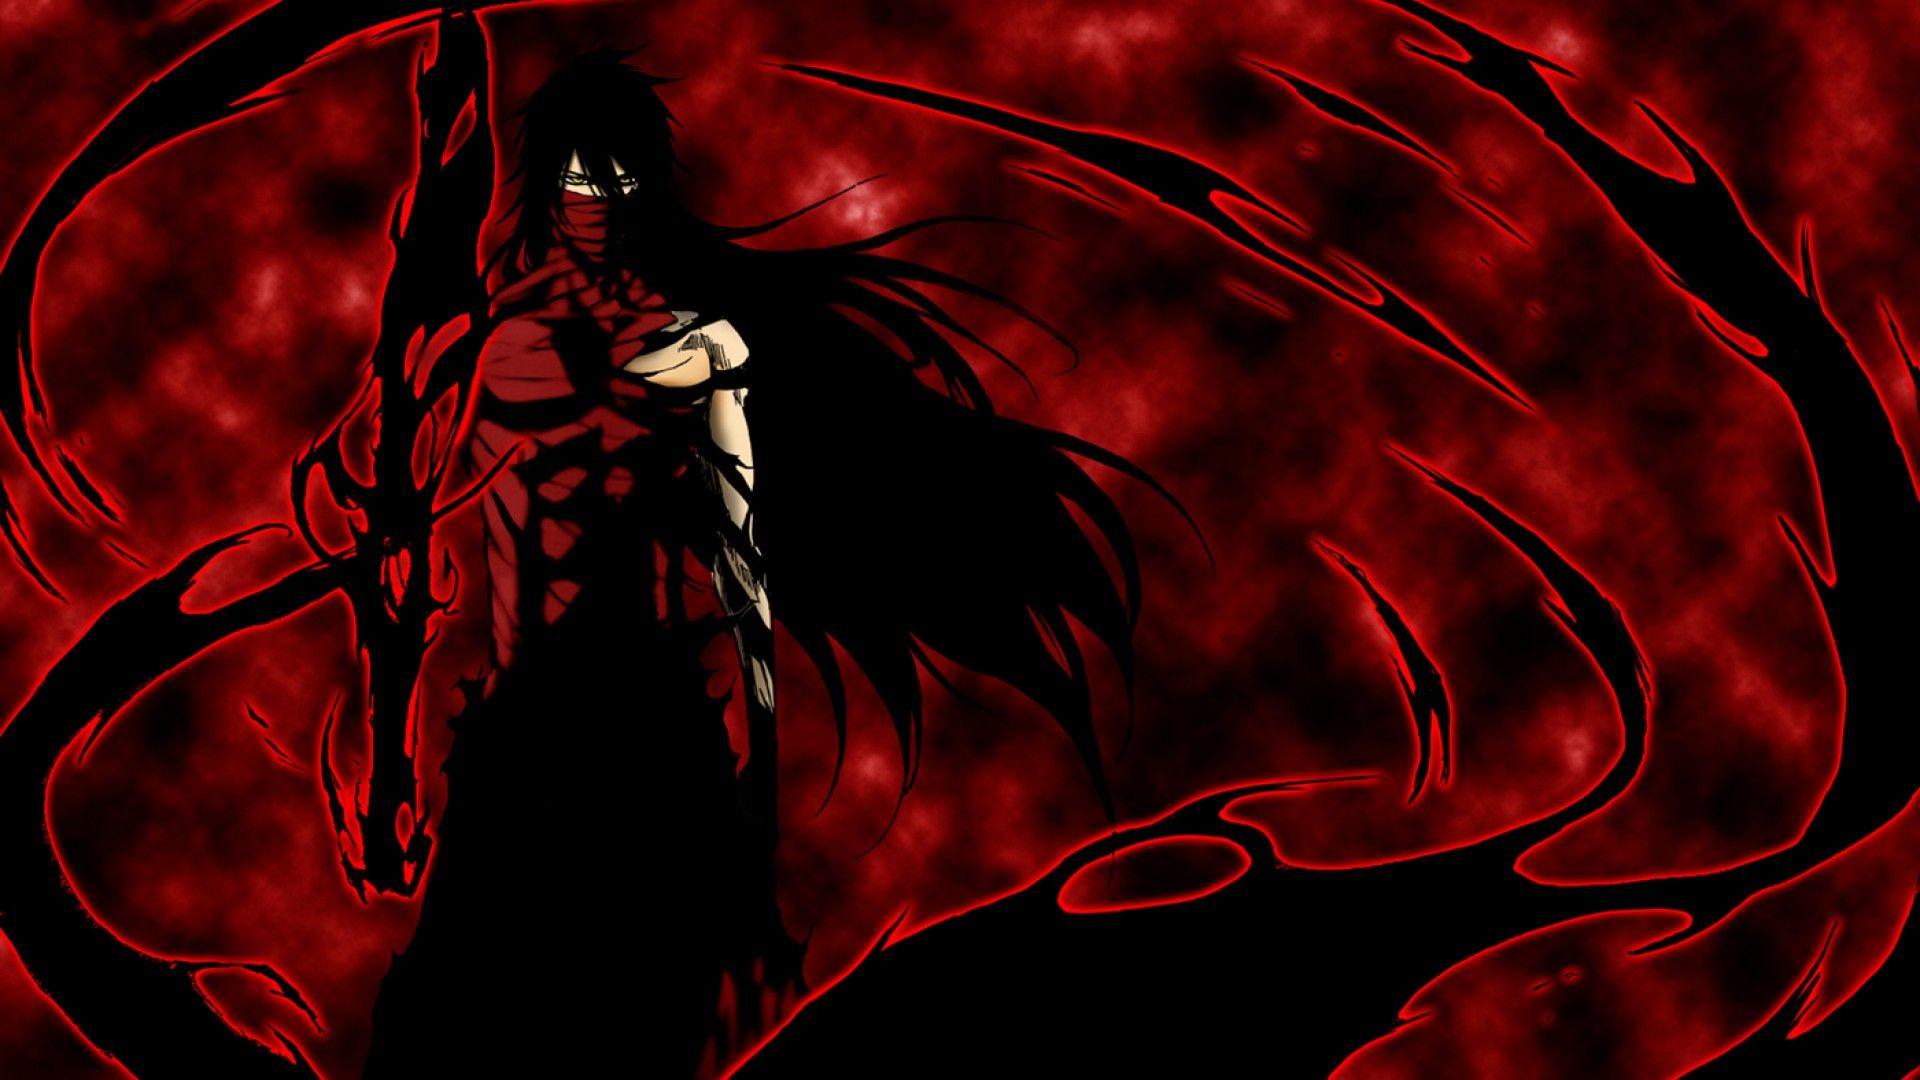 Bleach Final Getsuga Tenshou Kurosaki Ichigo Mugetsu 1400x1008 Bleach Galaxy Wallpaper Sword Art Online